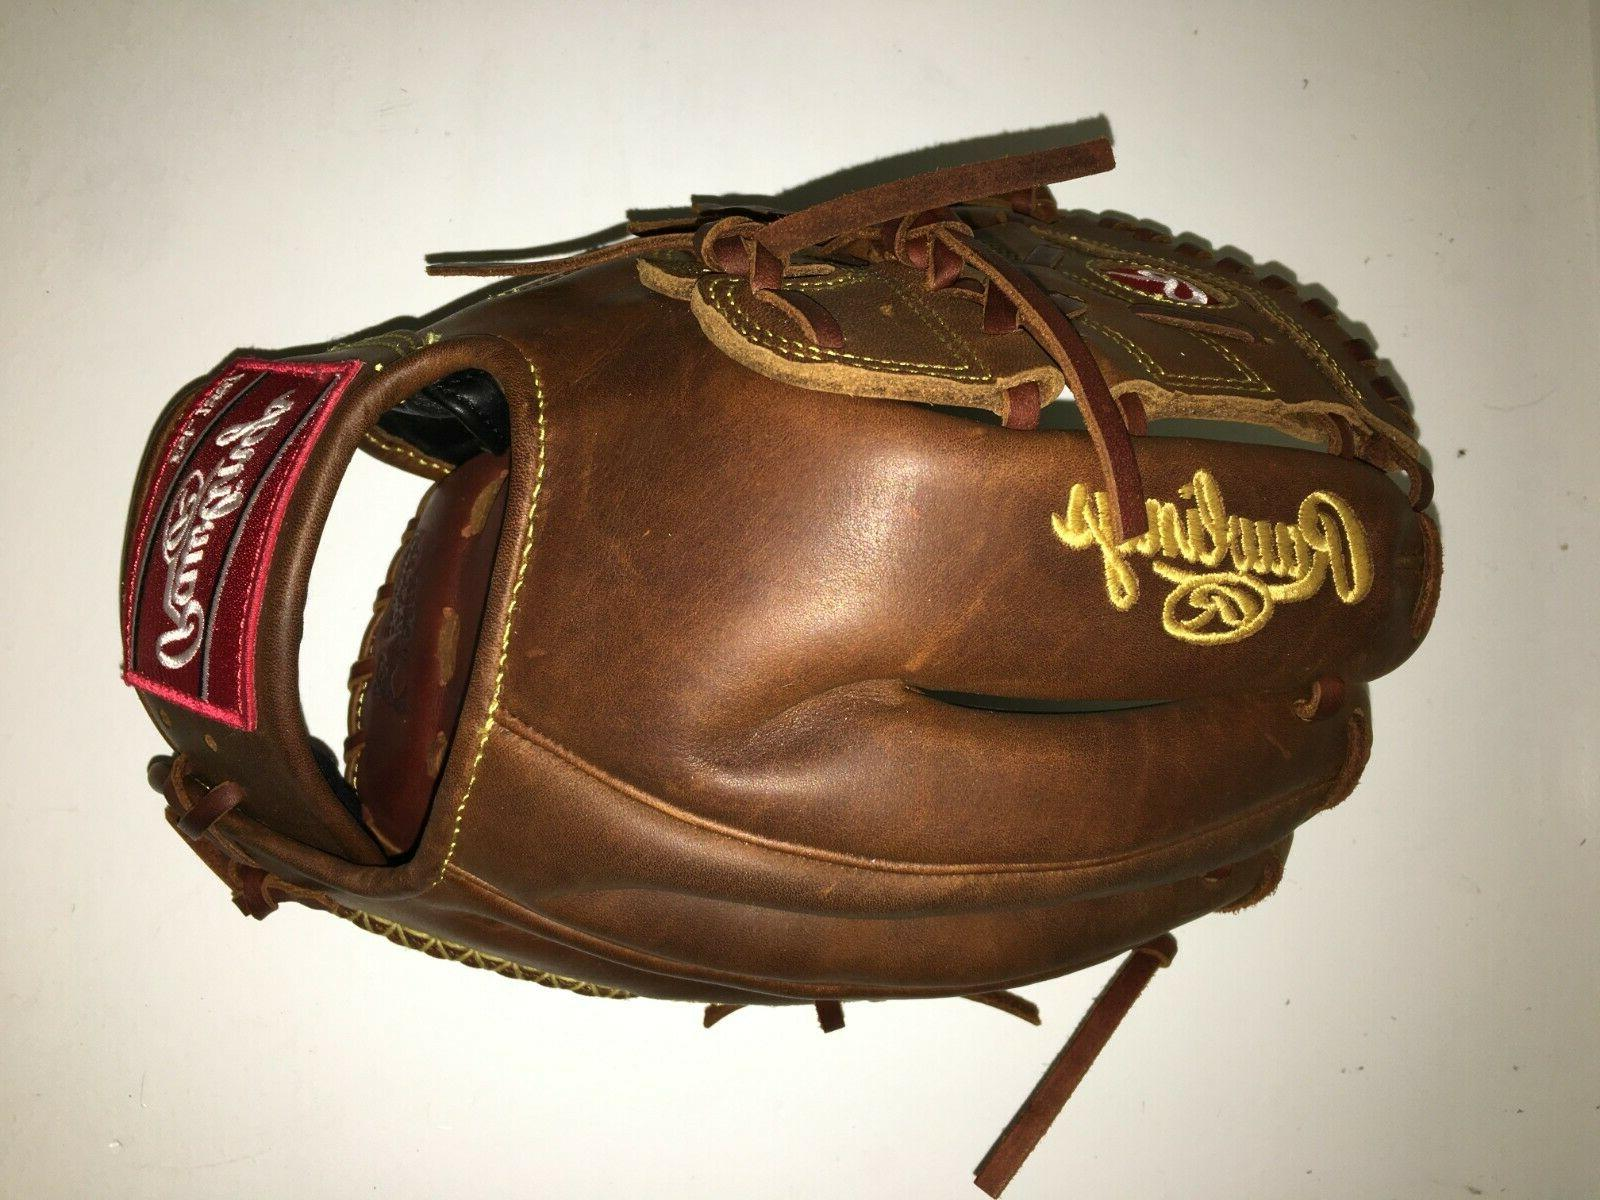 NEW Rawlings Heart the Baseball SHIFT